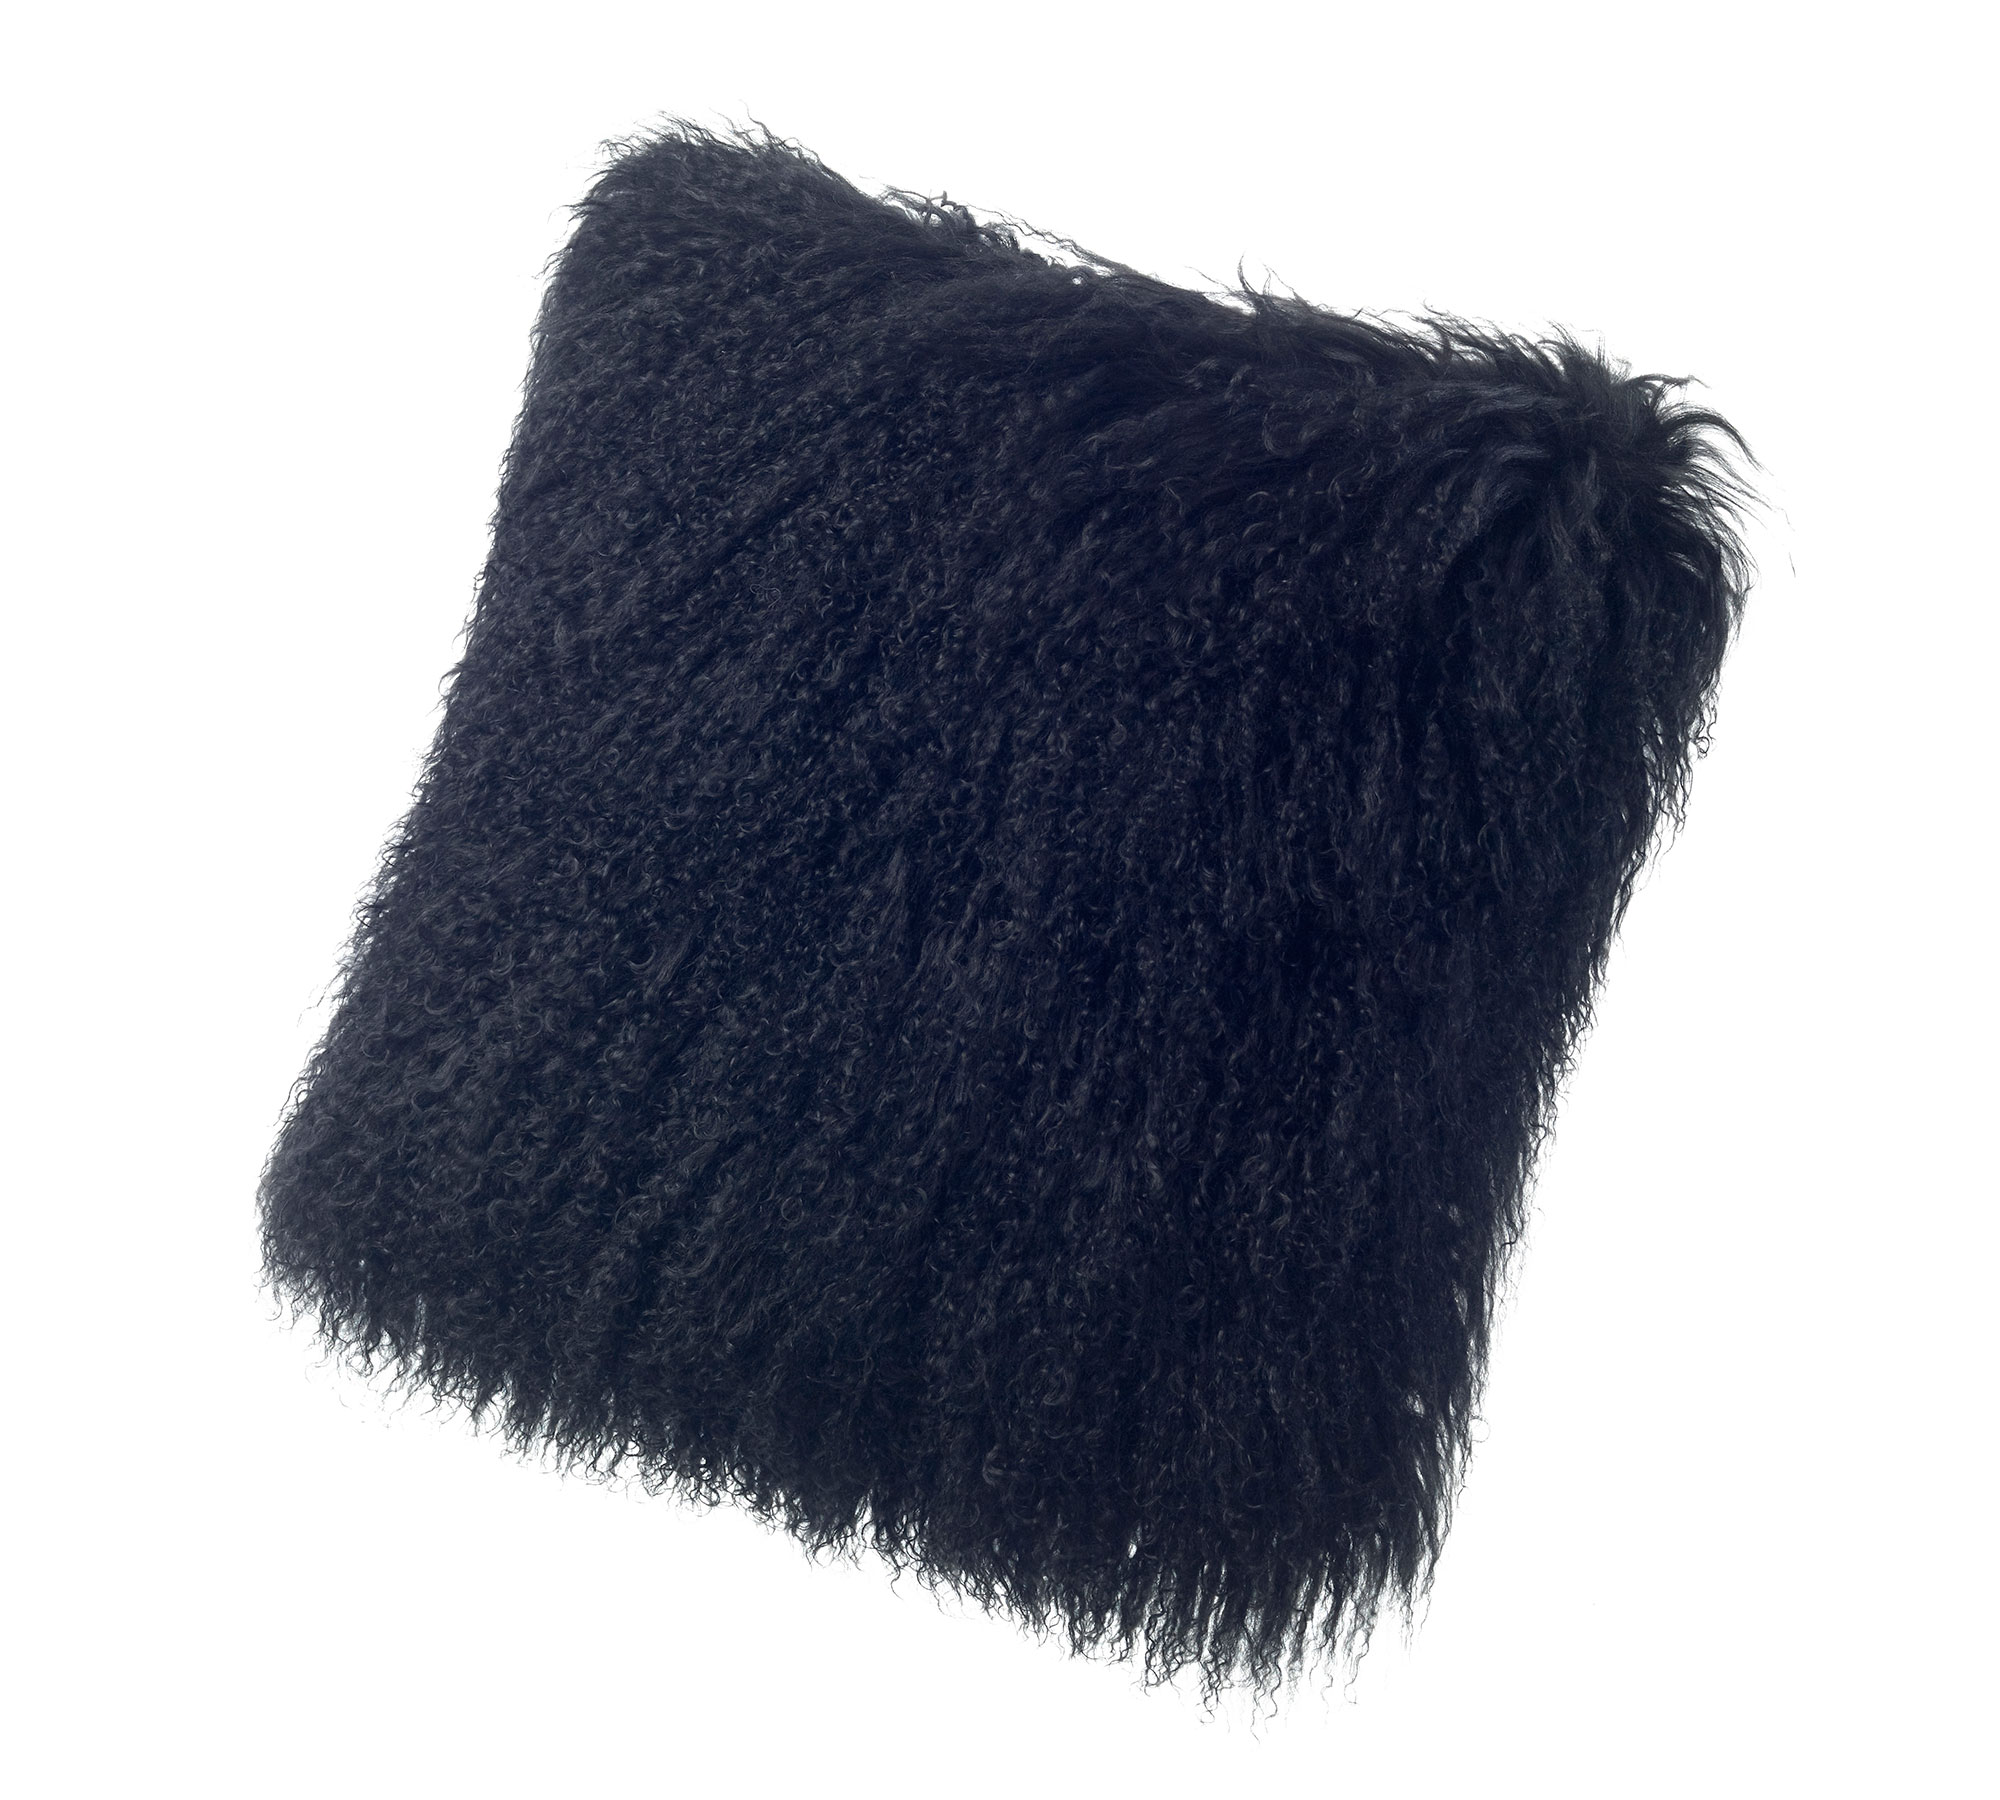 Tibetan Lambskin Curly Fur throw pillows black